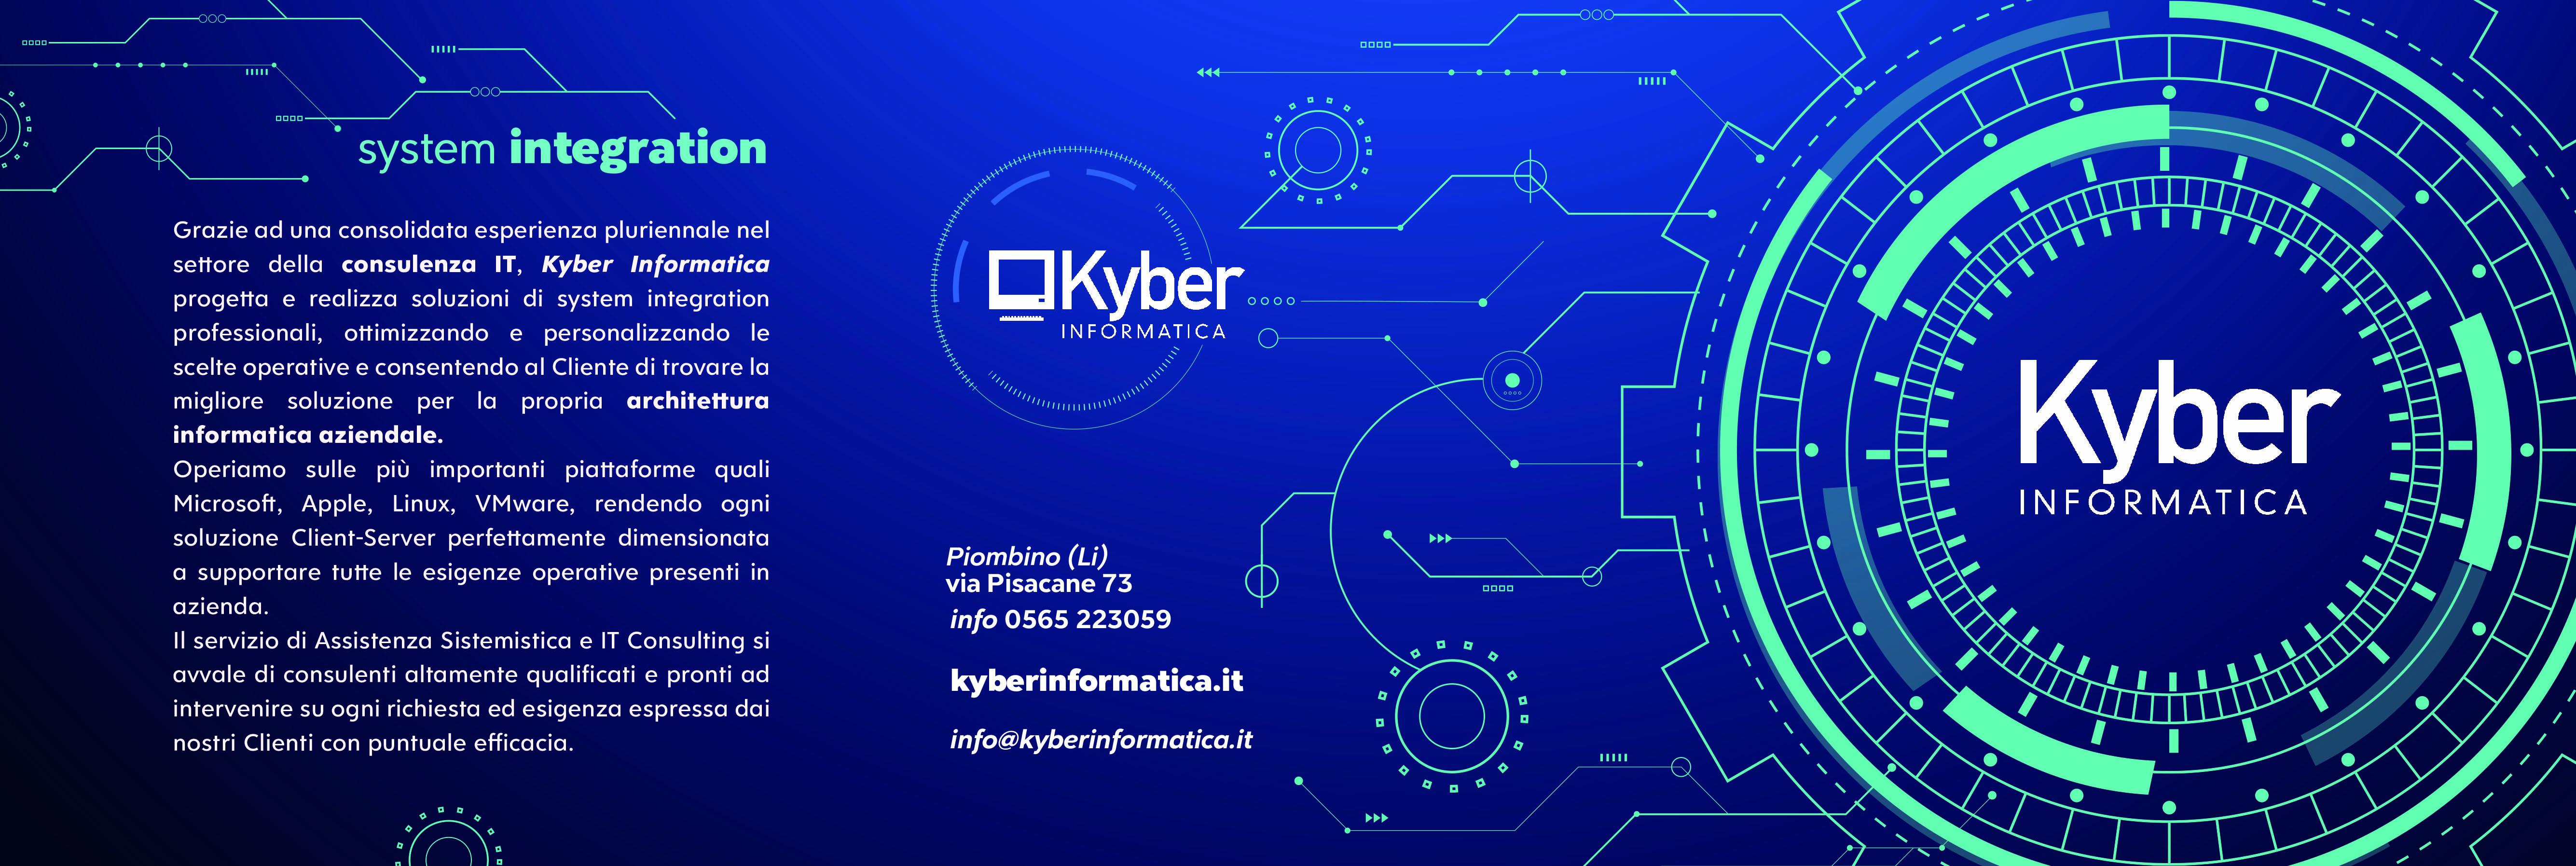 Kyber Informatica